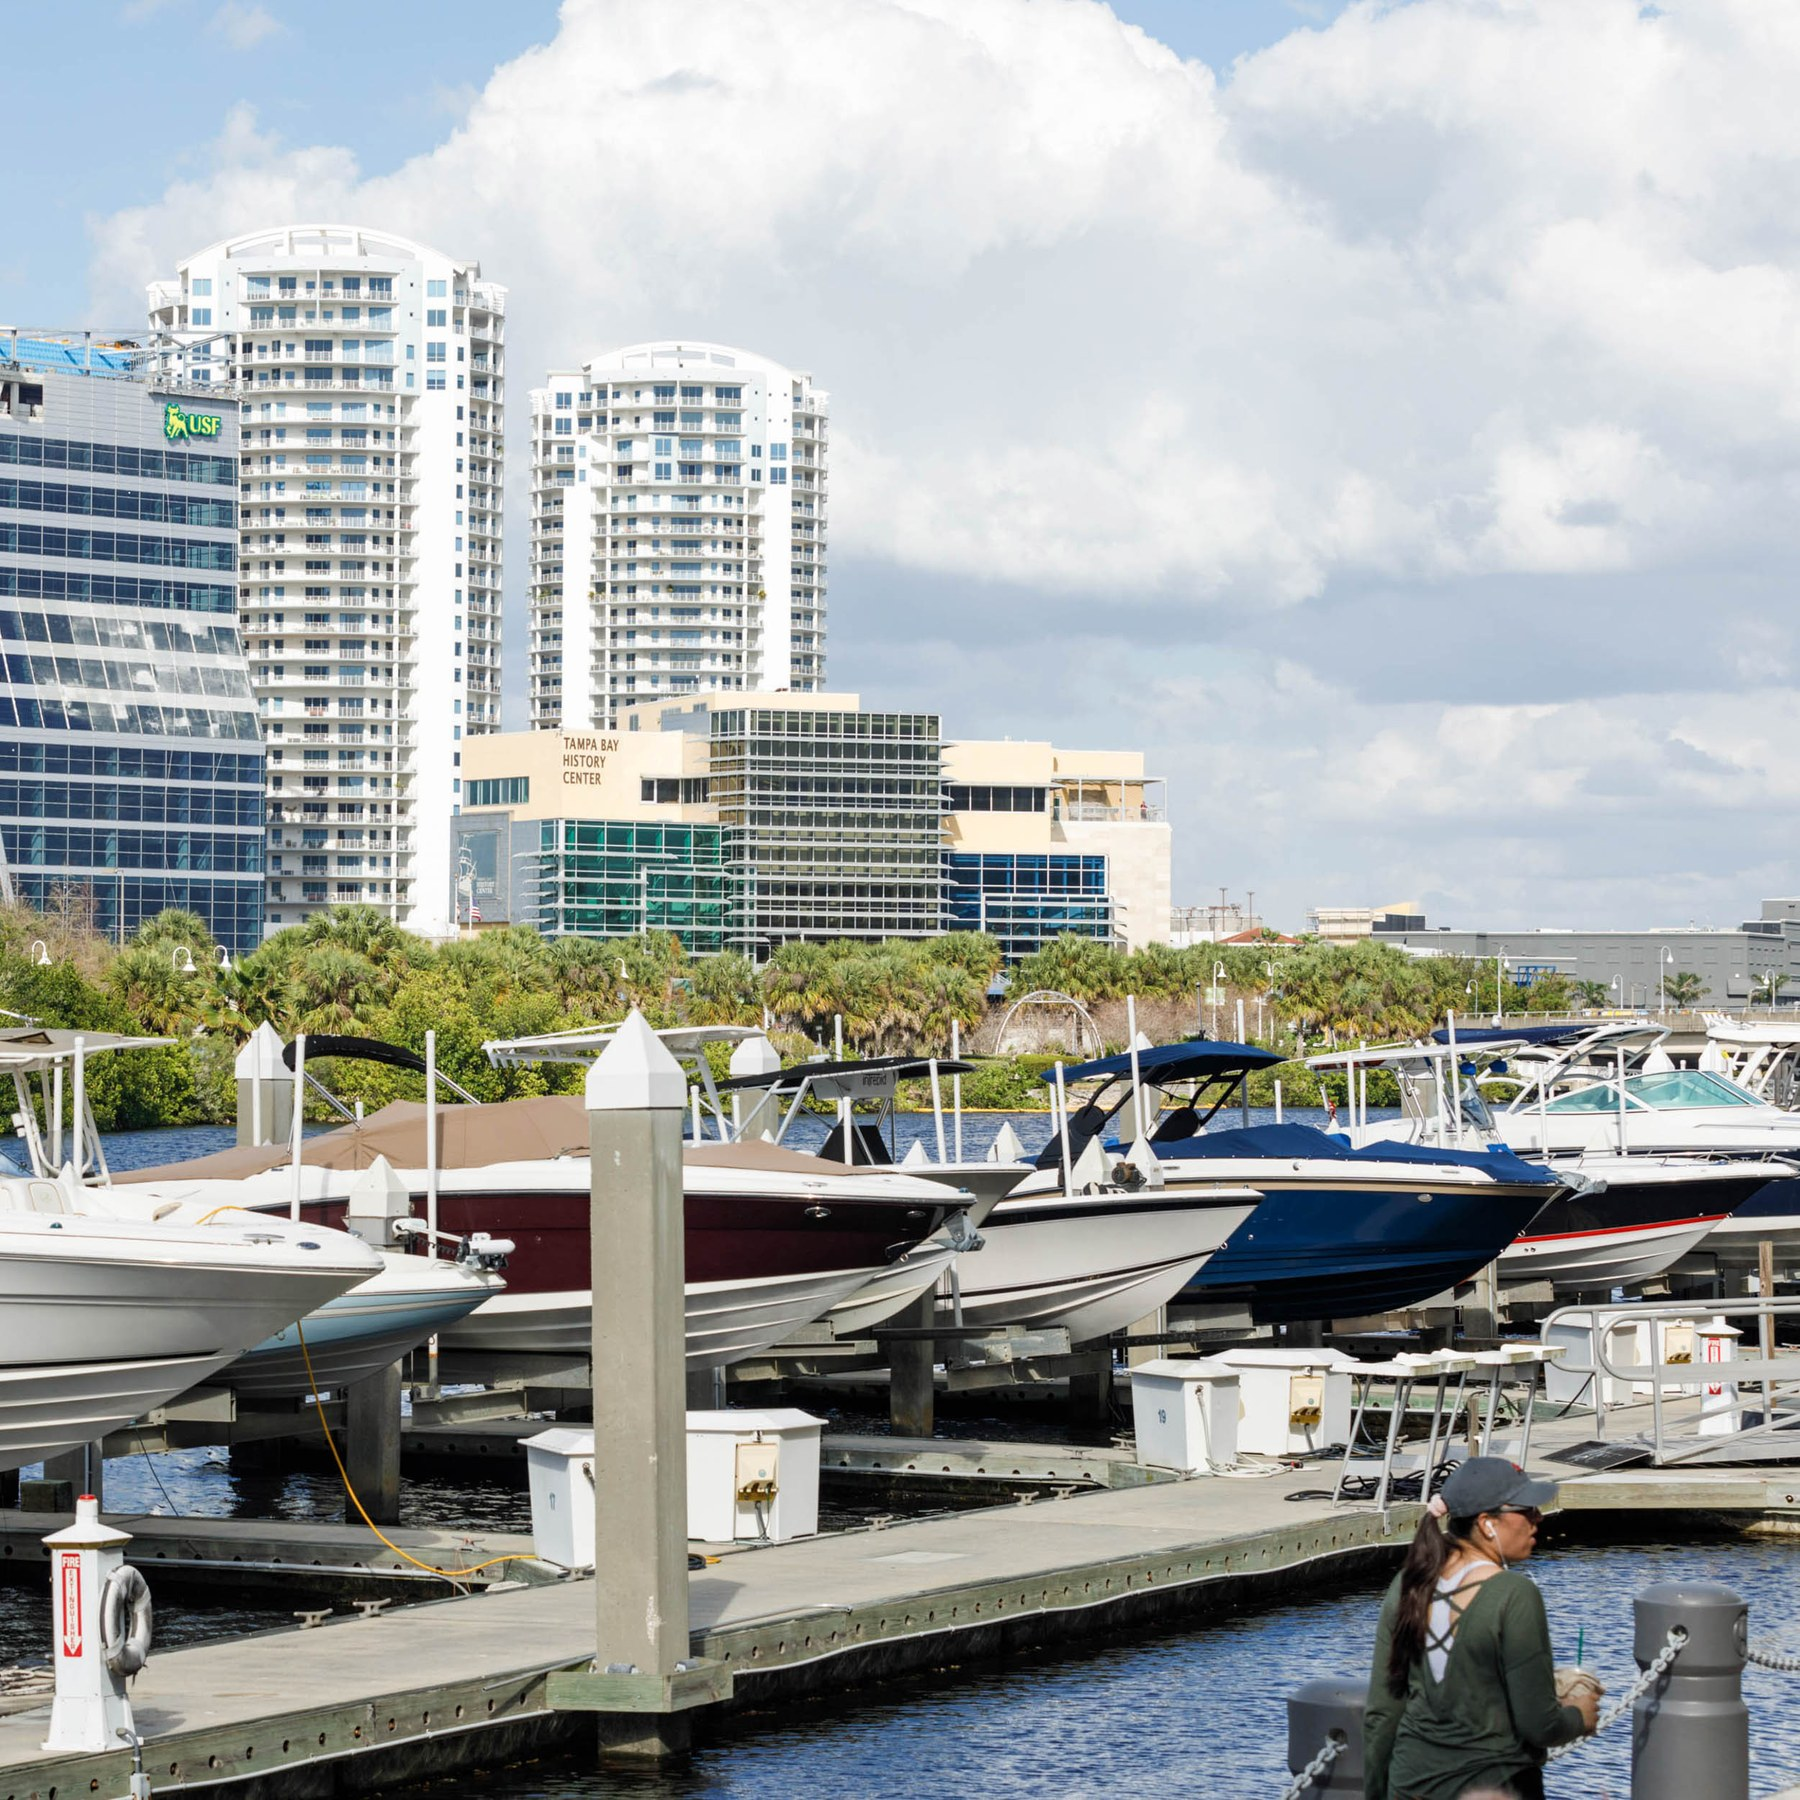 Harbor Island Apartments: Harbour Island, Tampa FL - Neighborhood Guide